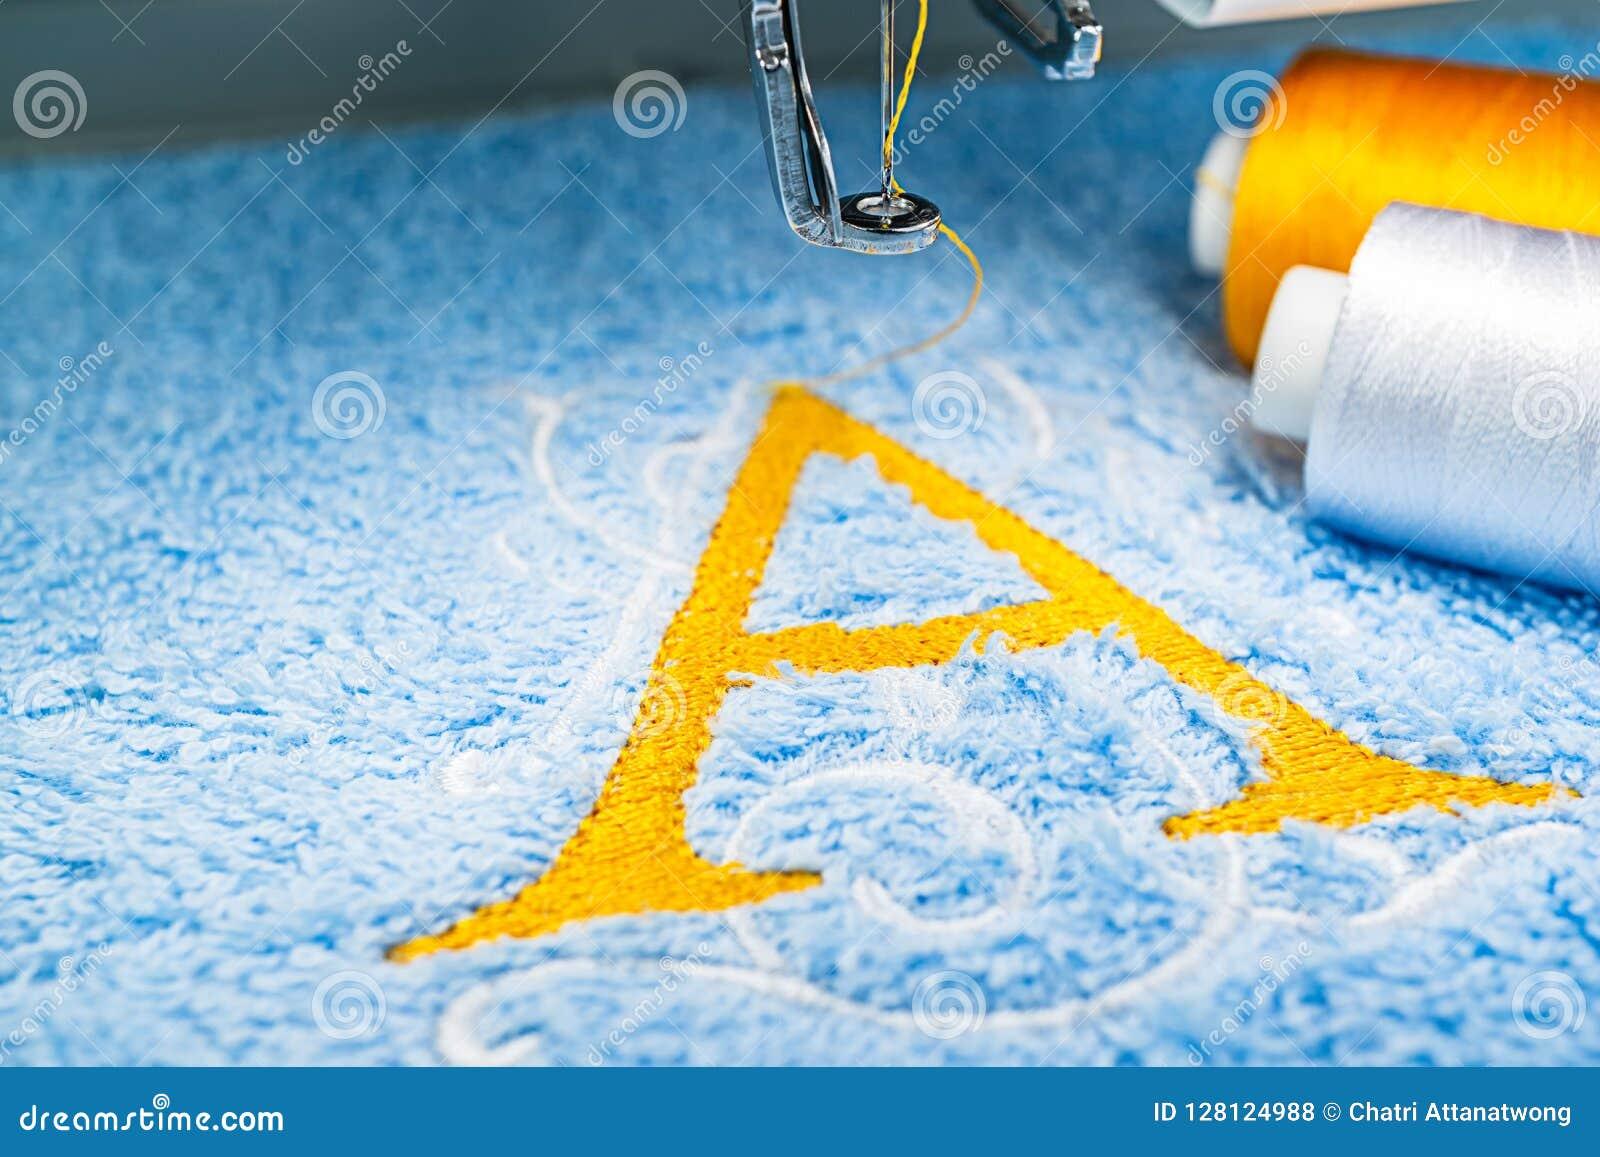 Alphabet Logo Design On Towel In Hoop Of Embroidery Machine Stock